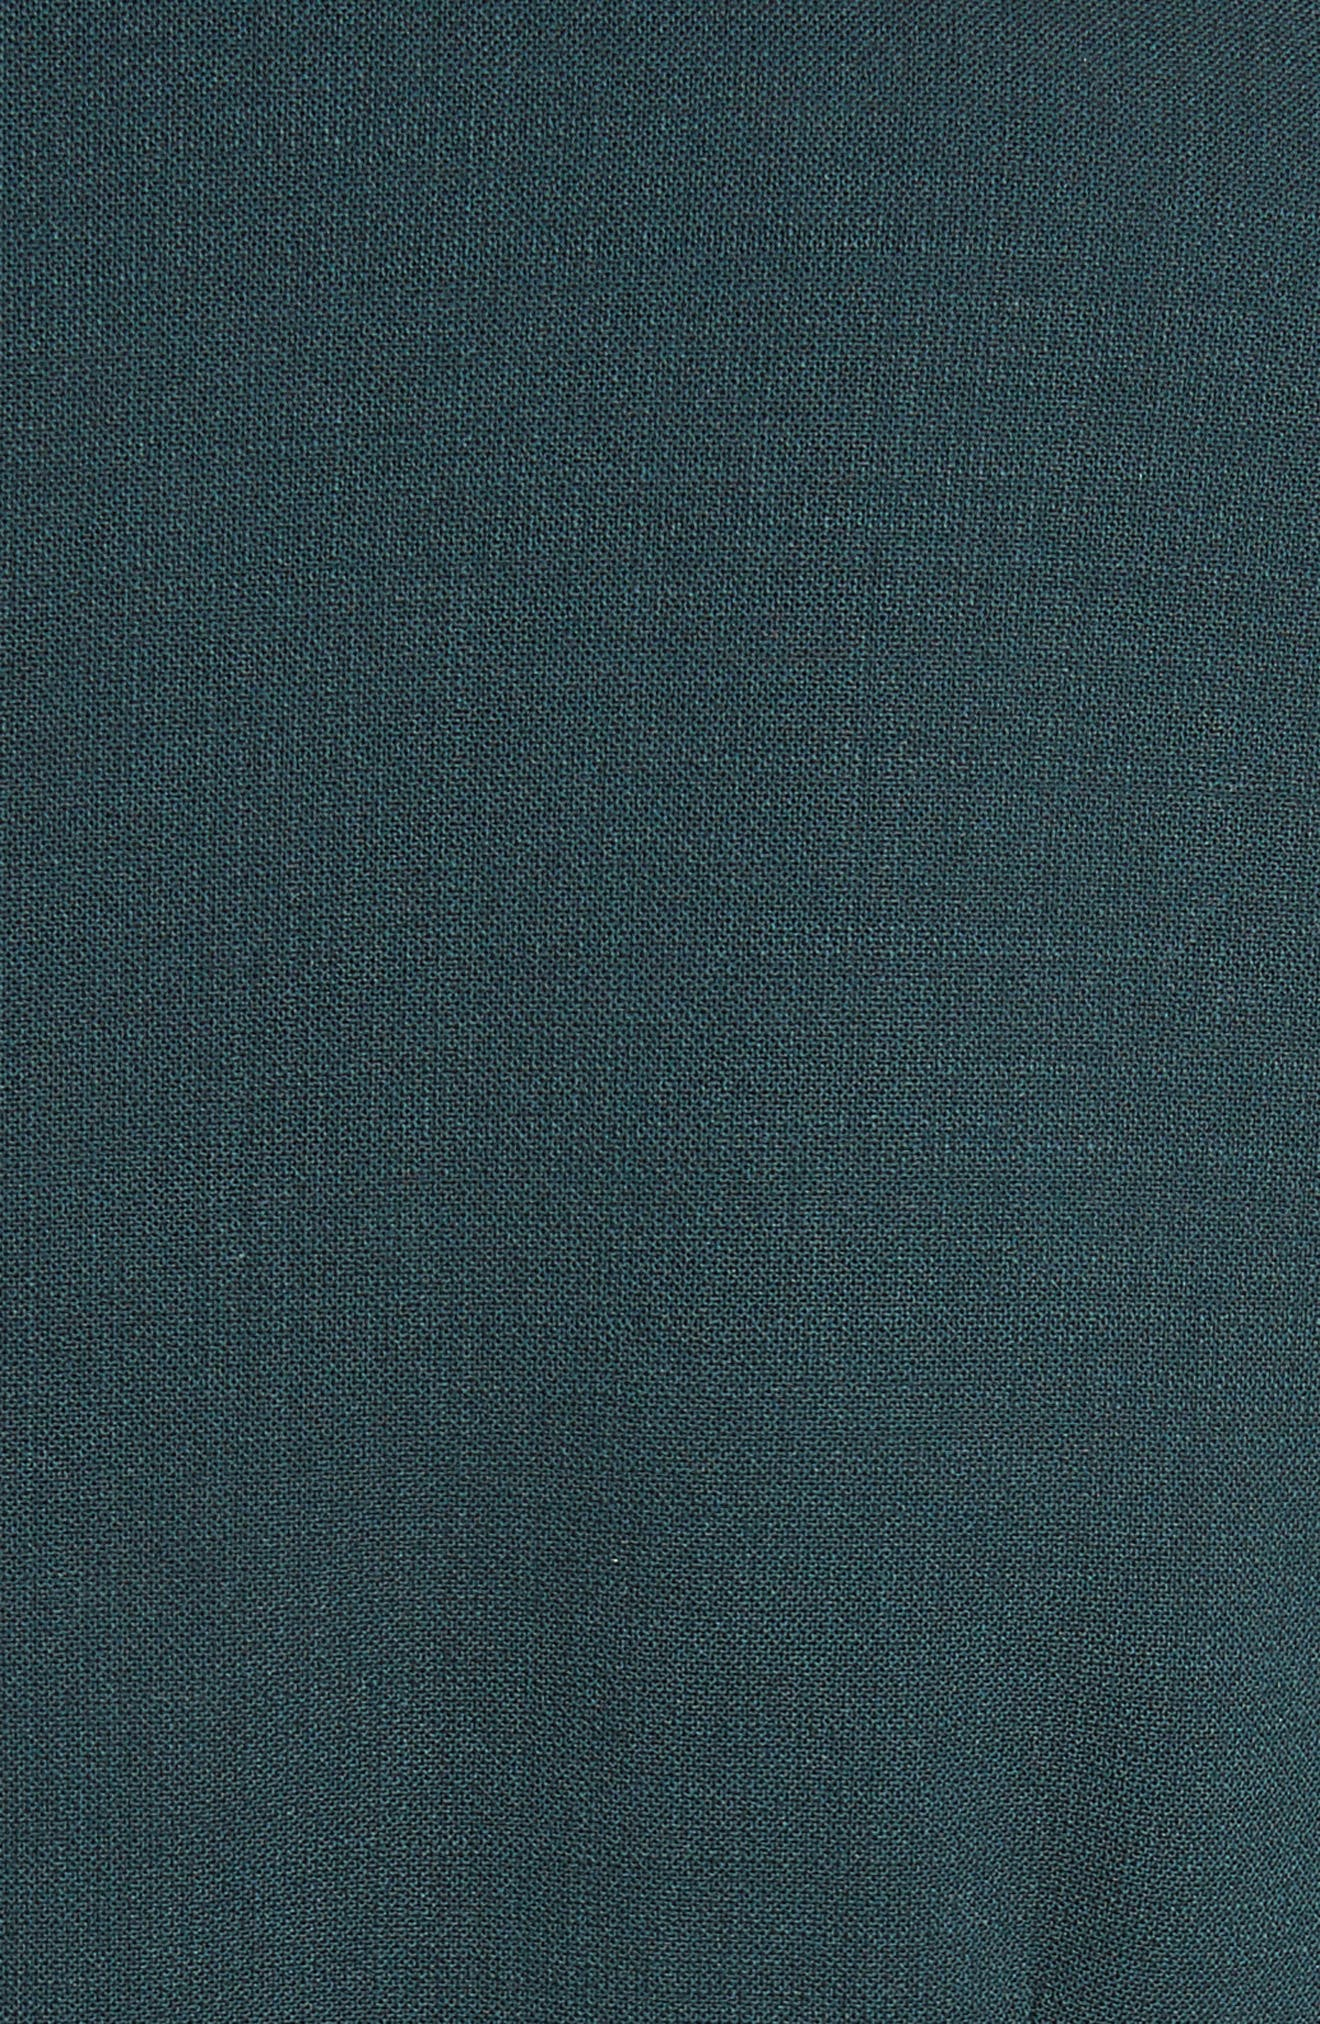 Umano Stretch Wool Sheath Dress,                             Alternate thumbnail 5, color,                             304